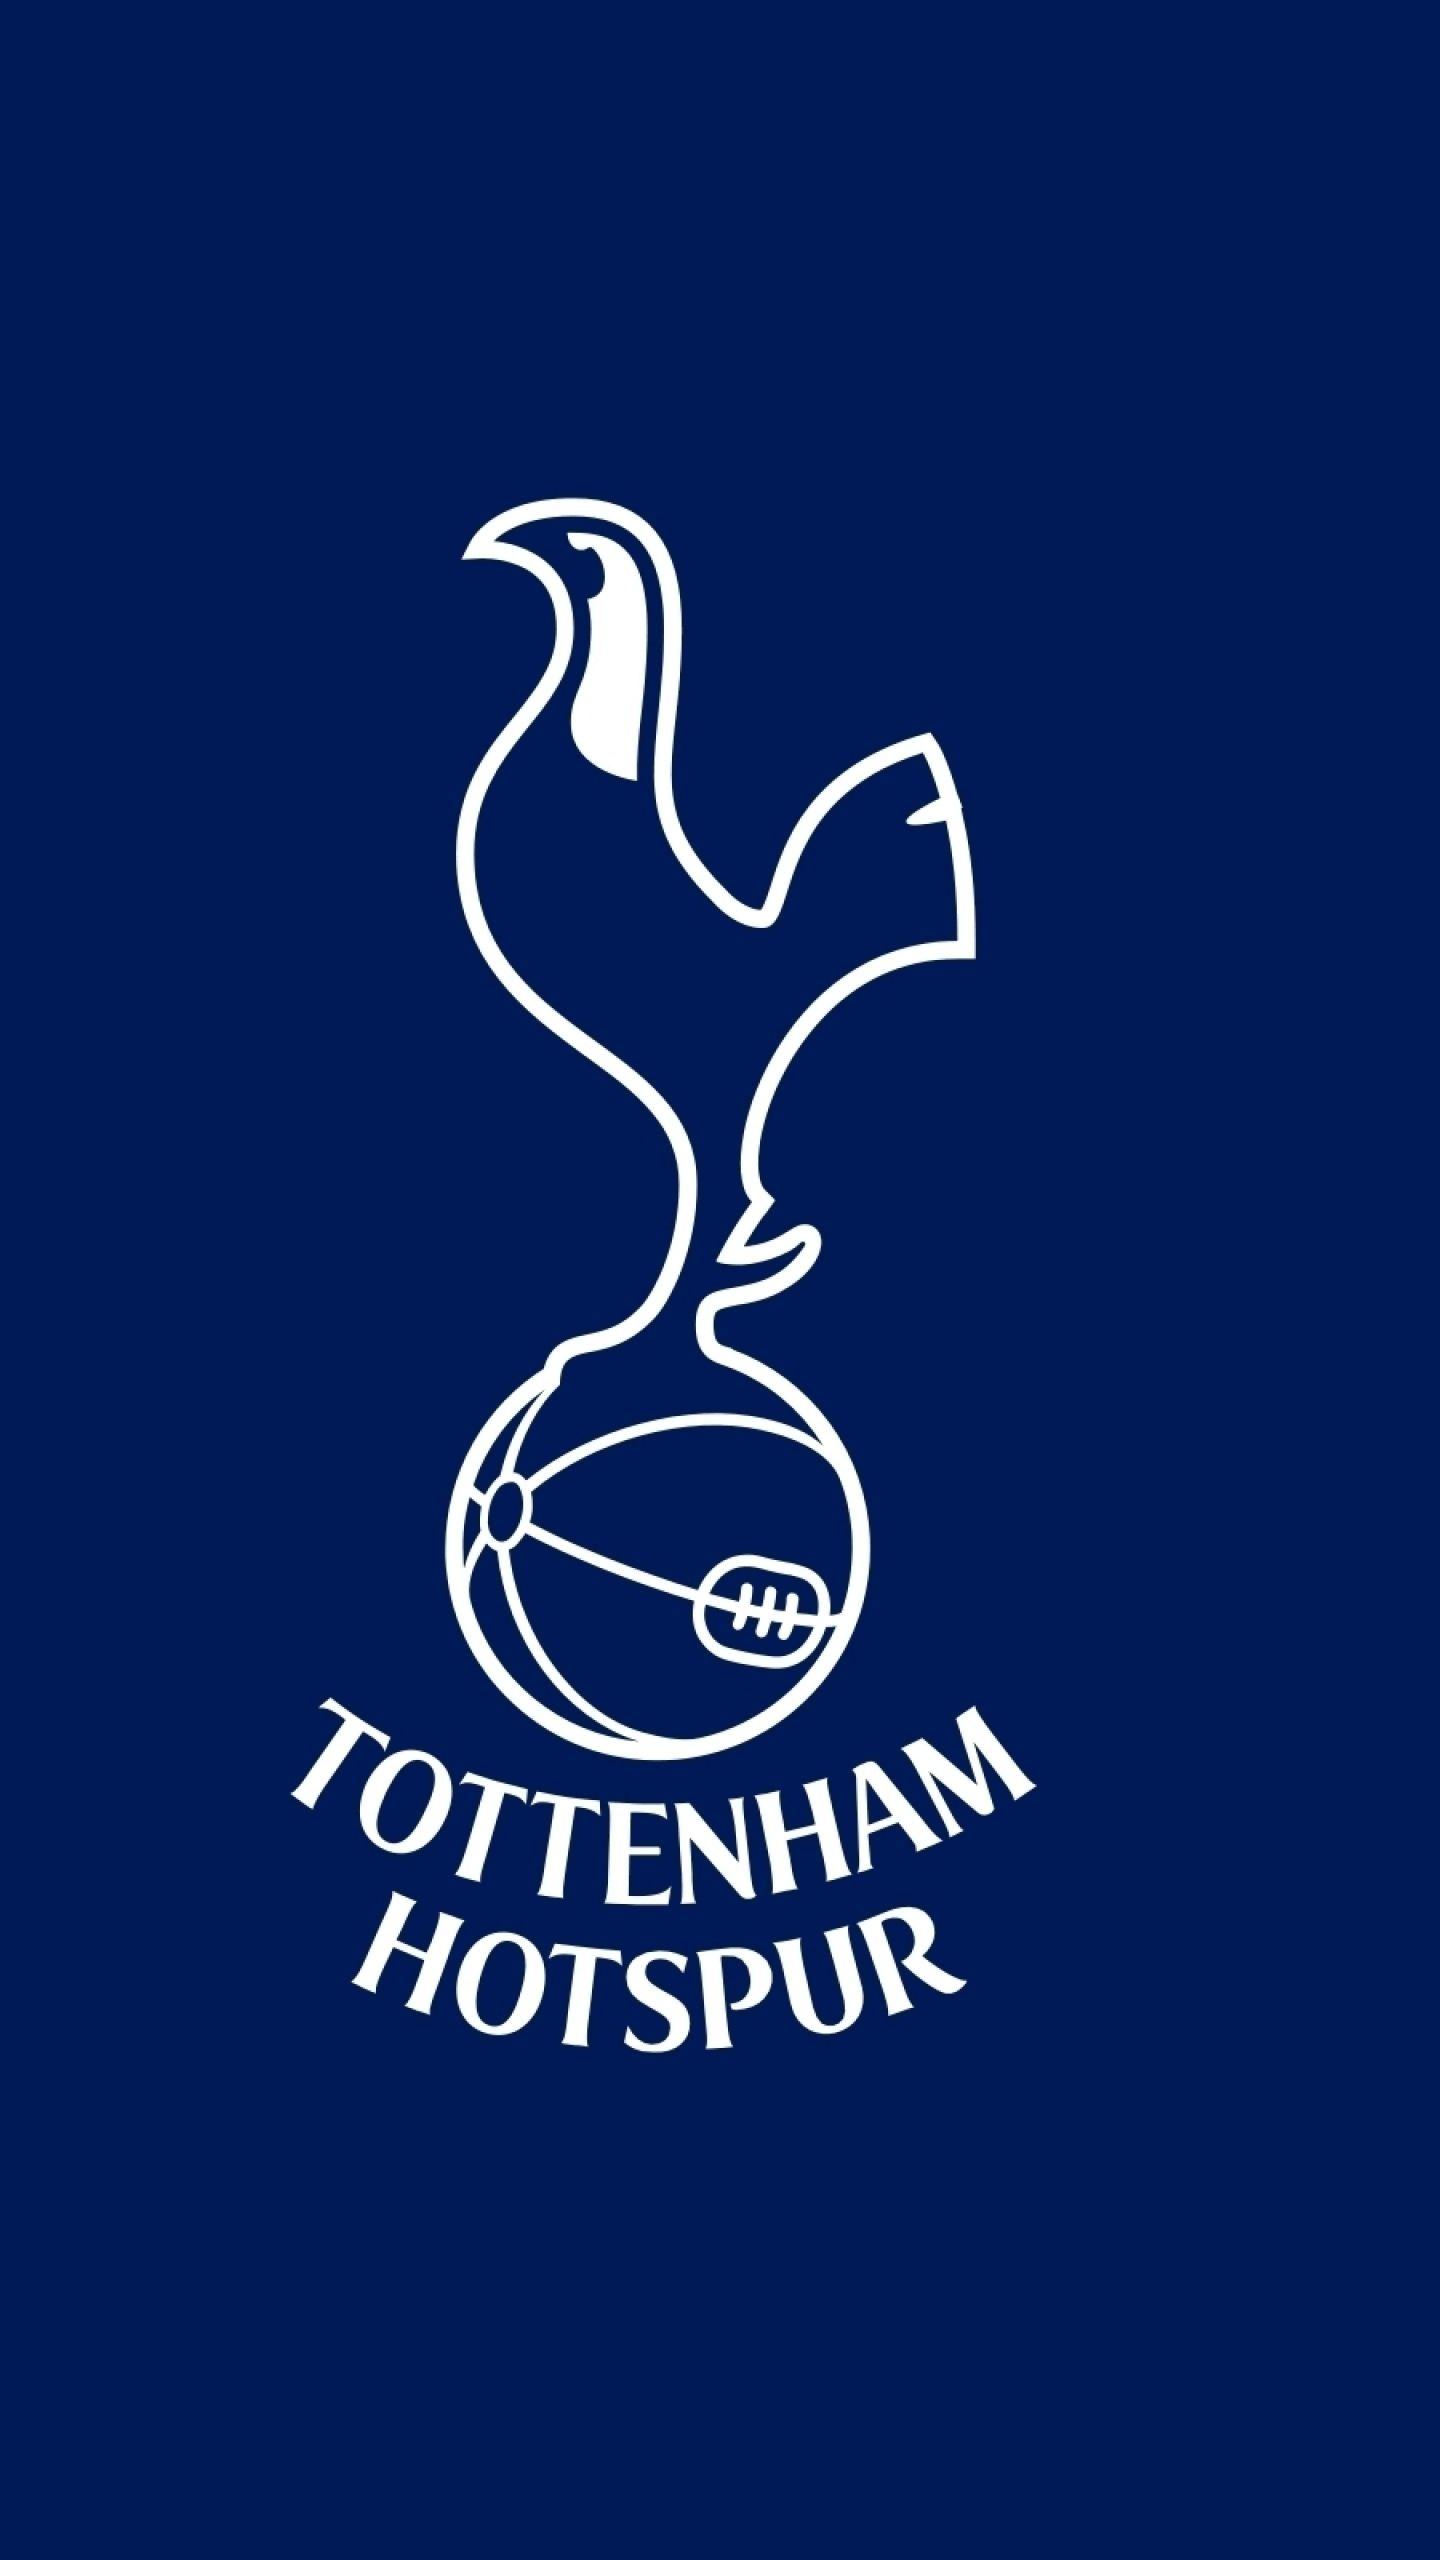 10 Latest Tottenham Hotspur Iphone Wallpaper FULL HD 19201080 For 1440x2560